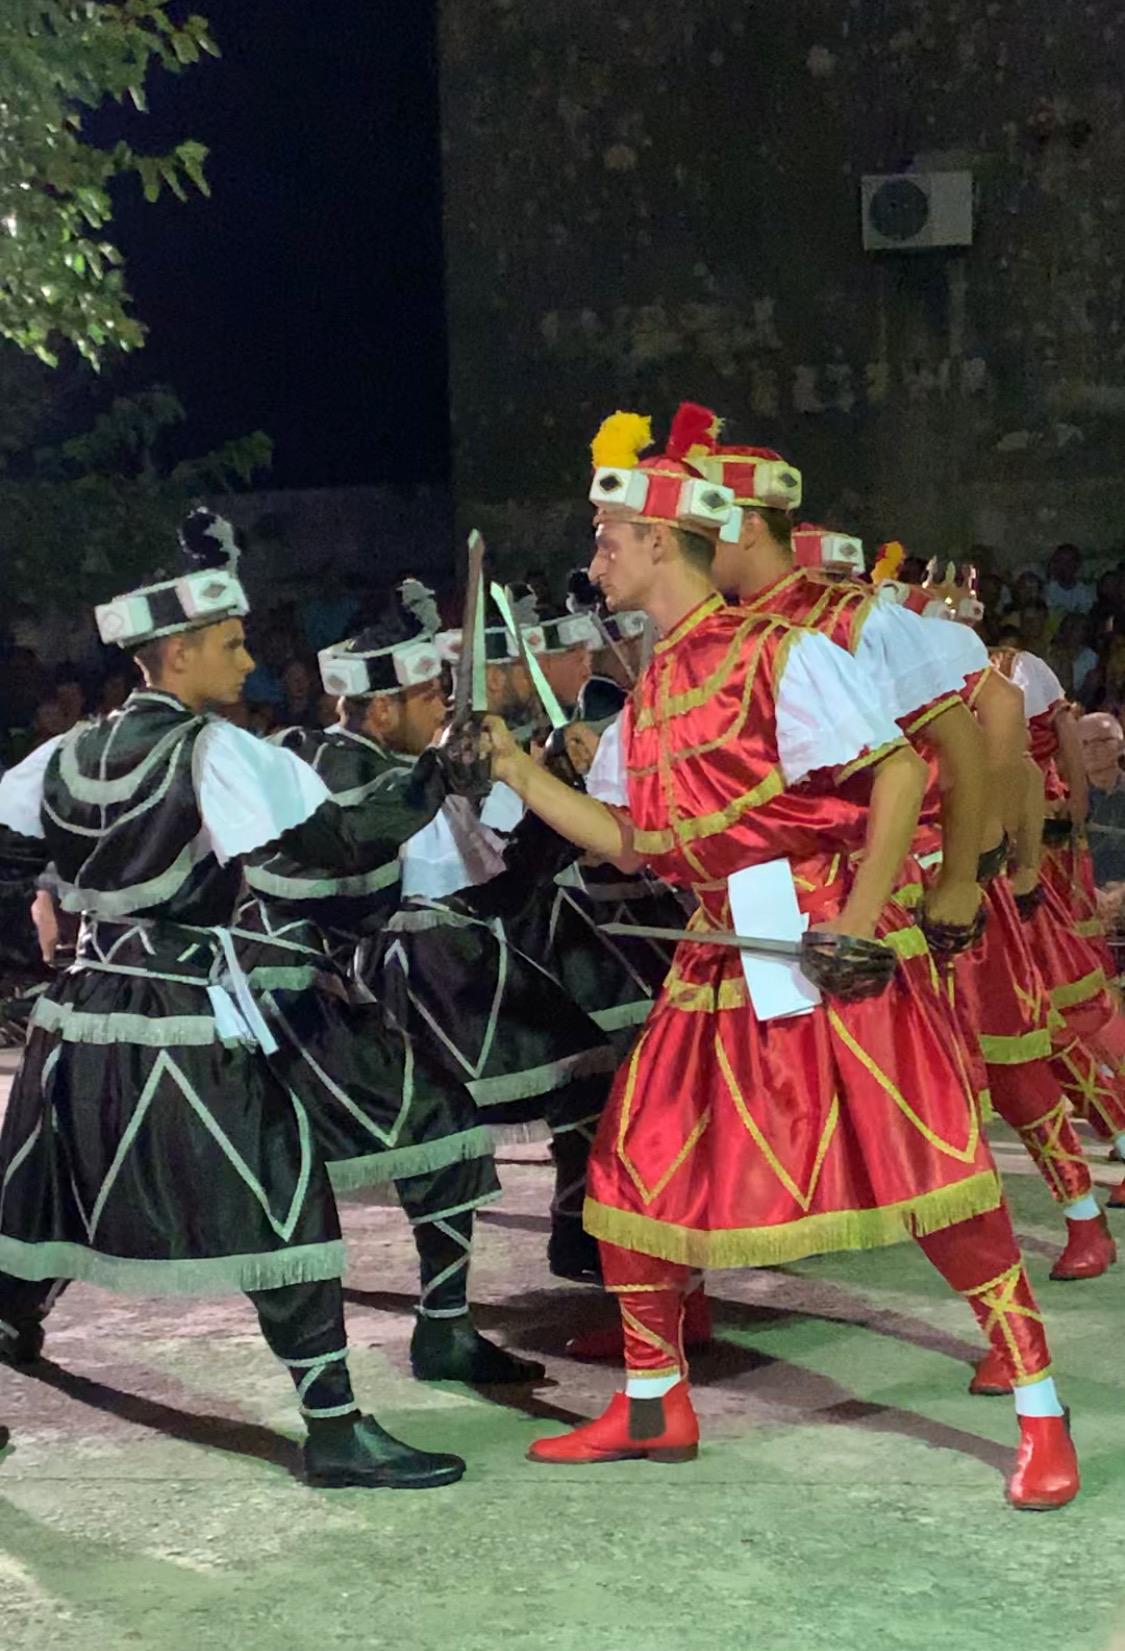 Moreska Korcula. The traditional sword dance performed only in Korcula